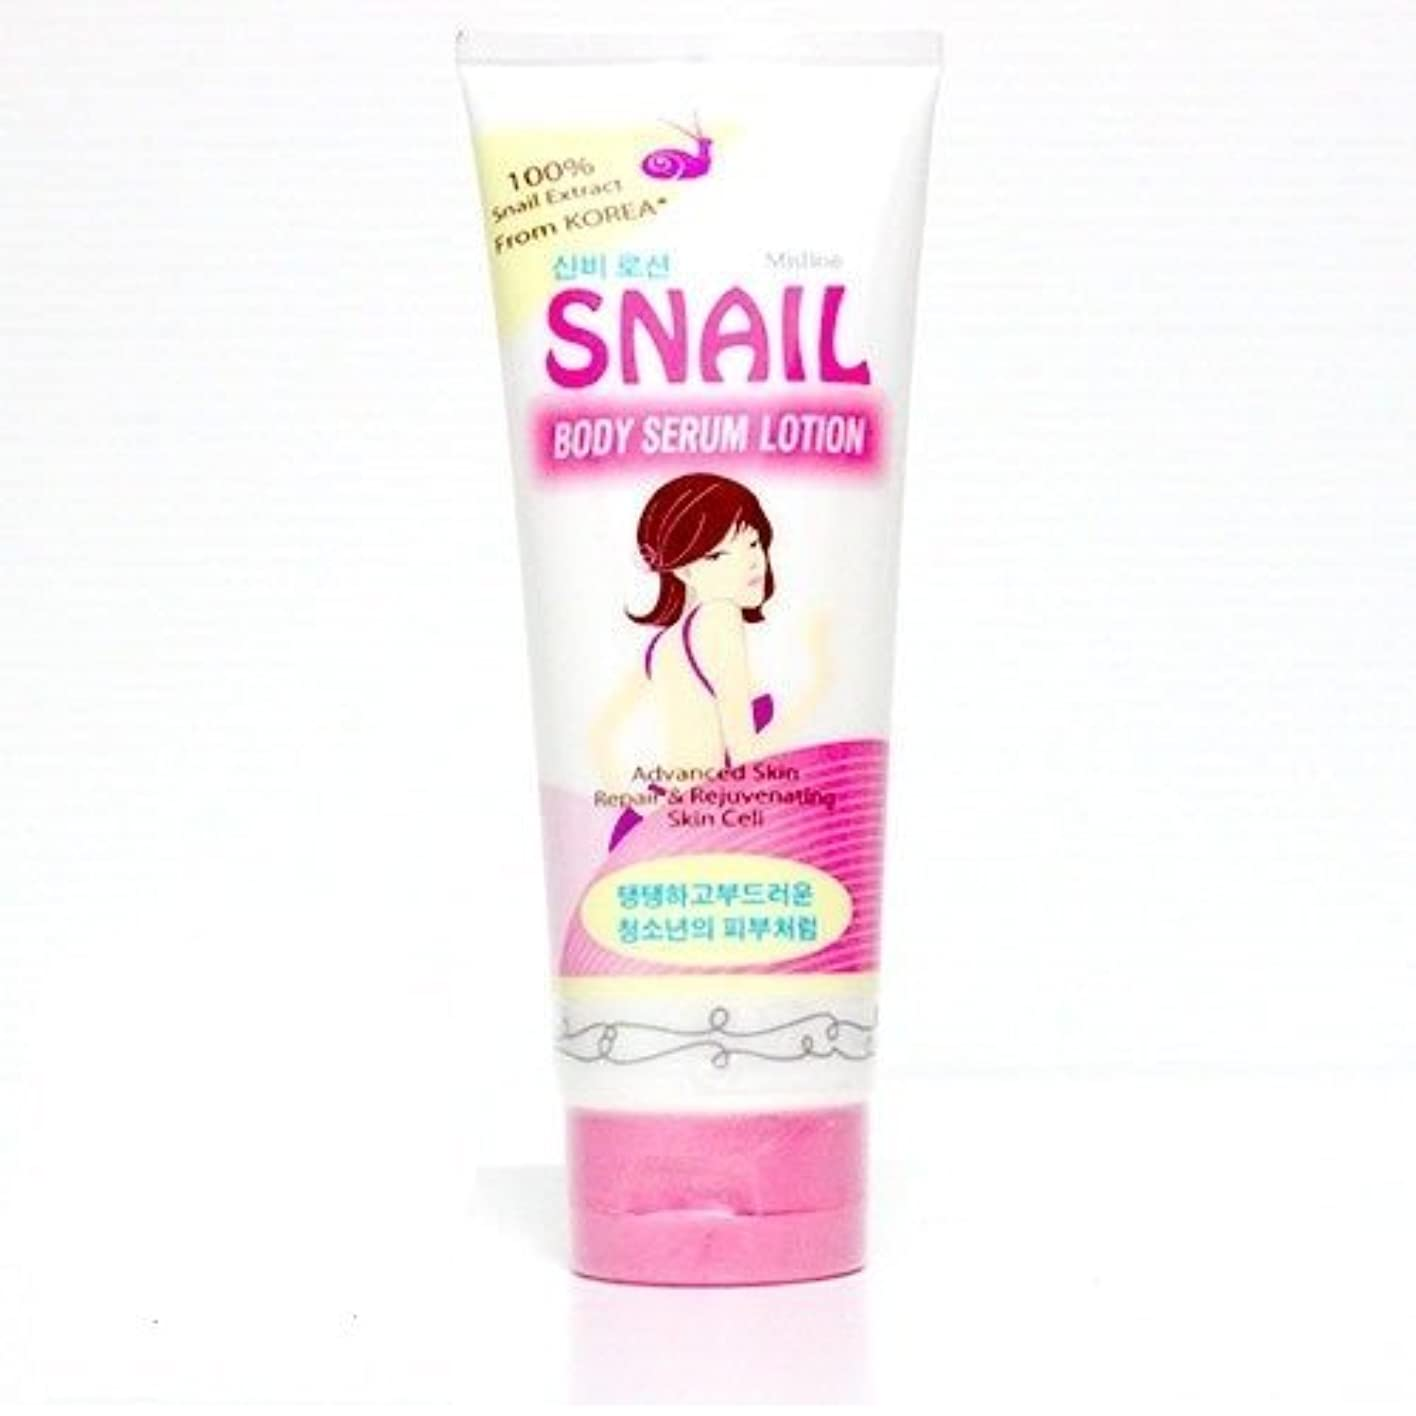 力学紀元前測るMistine Snail Body Serum Lotion 2 packs by Mistine [並行輸入品]